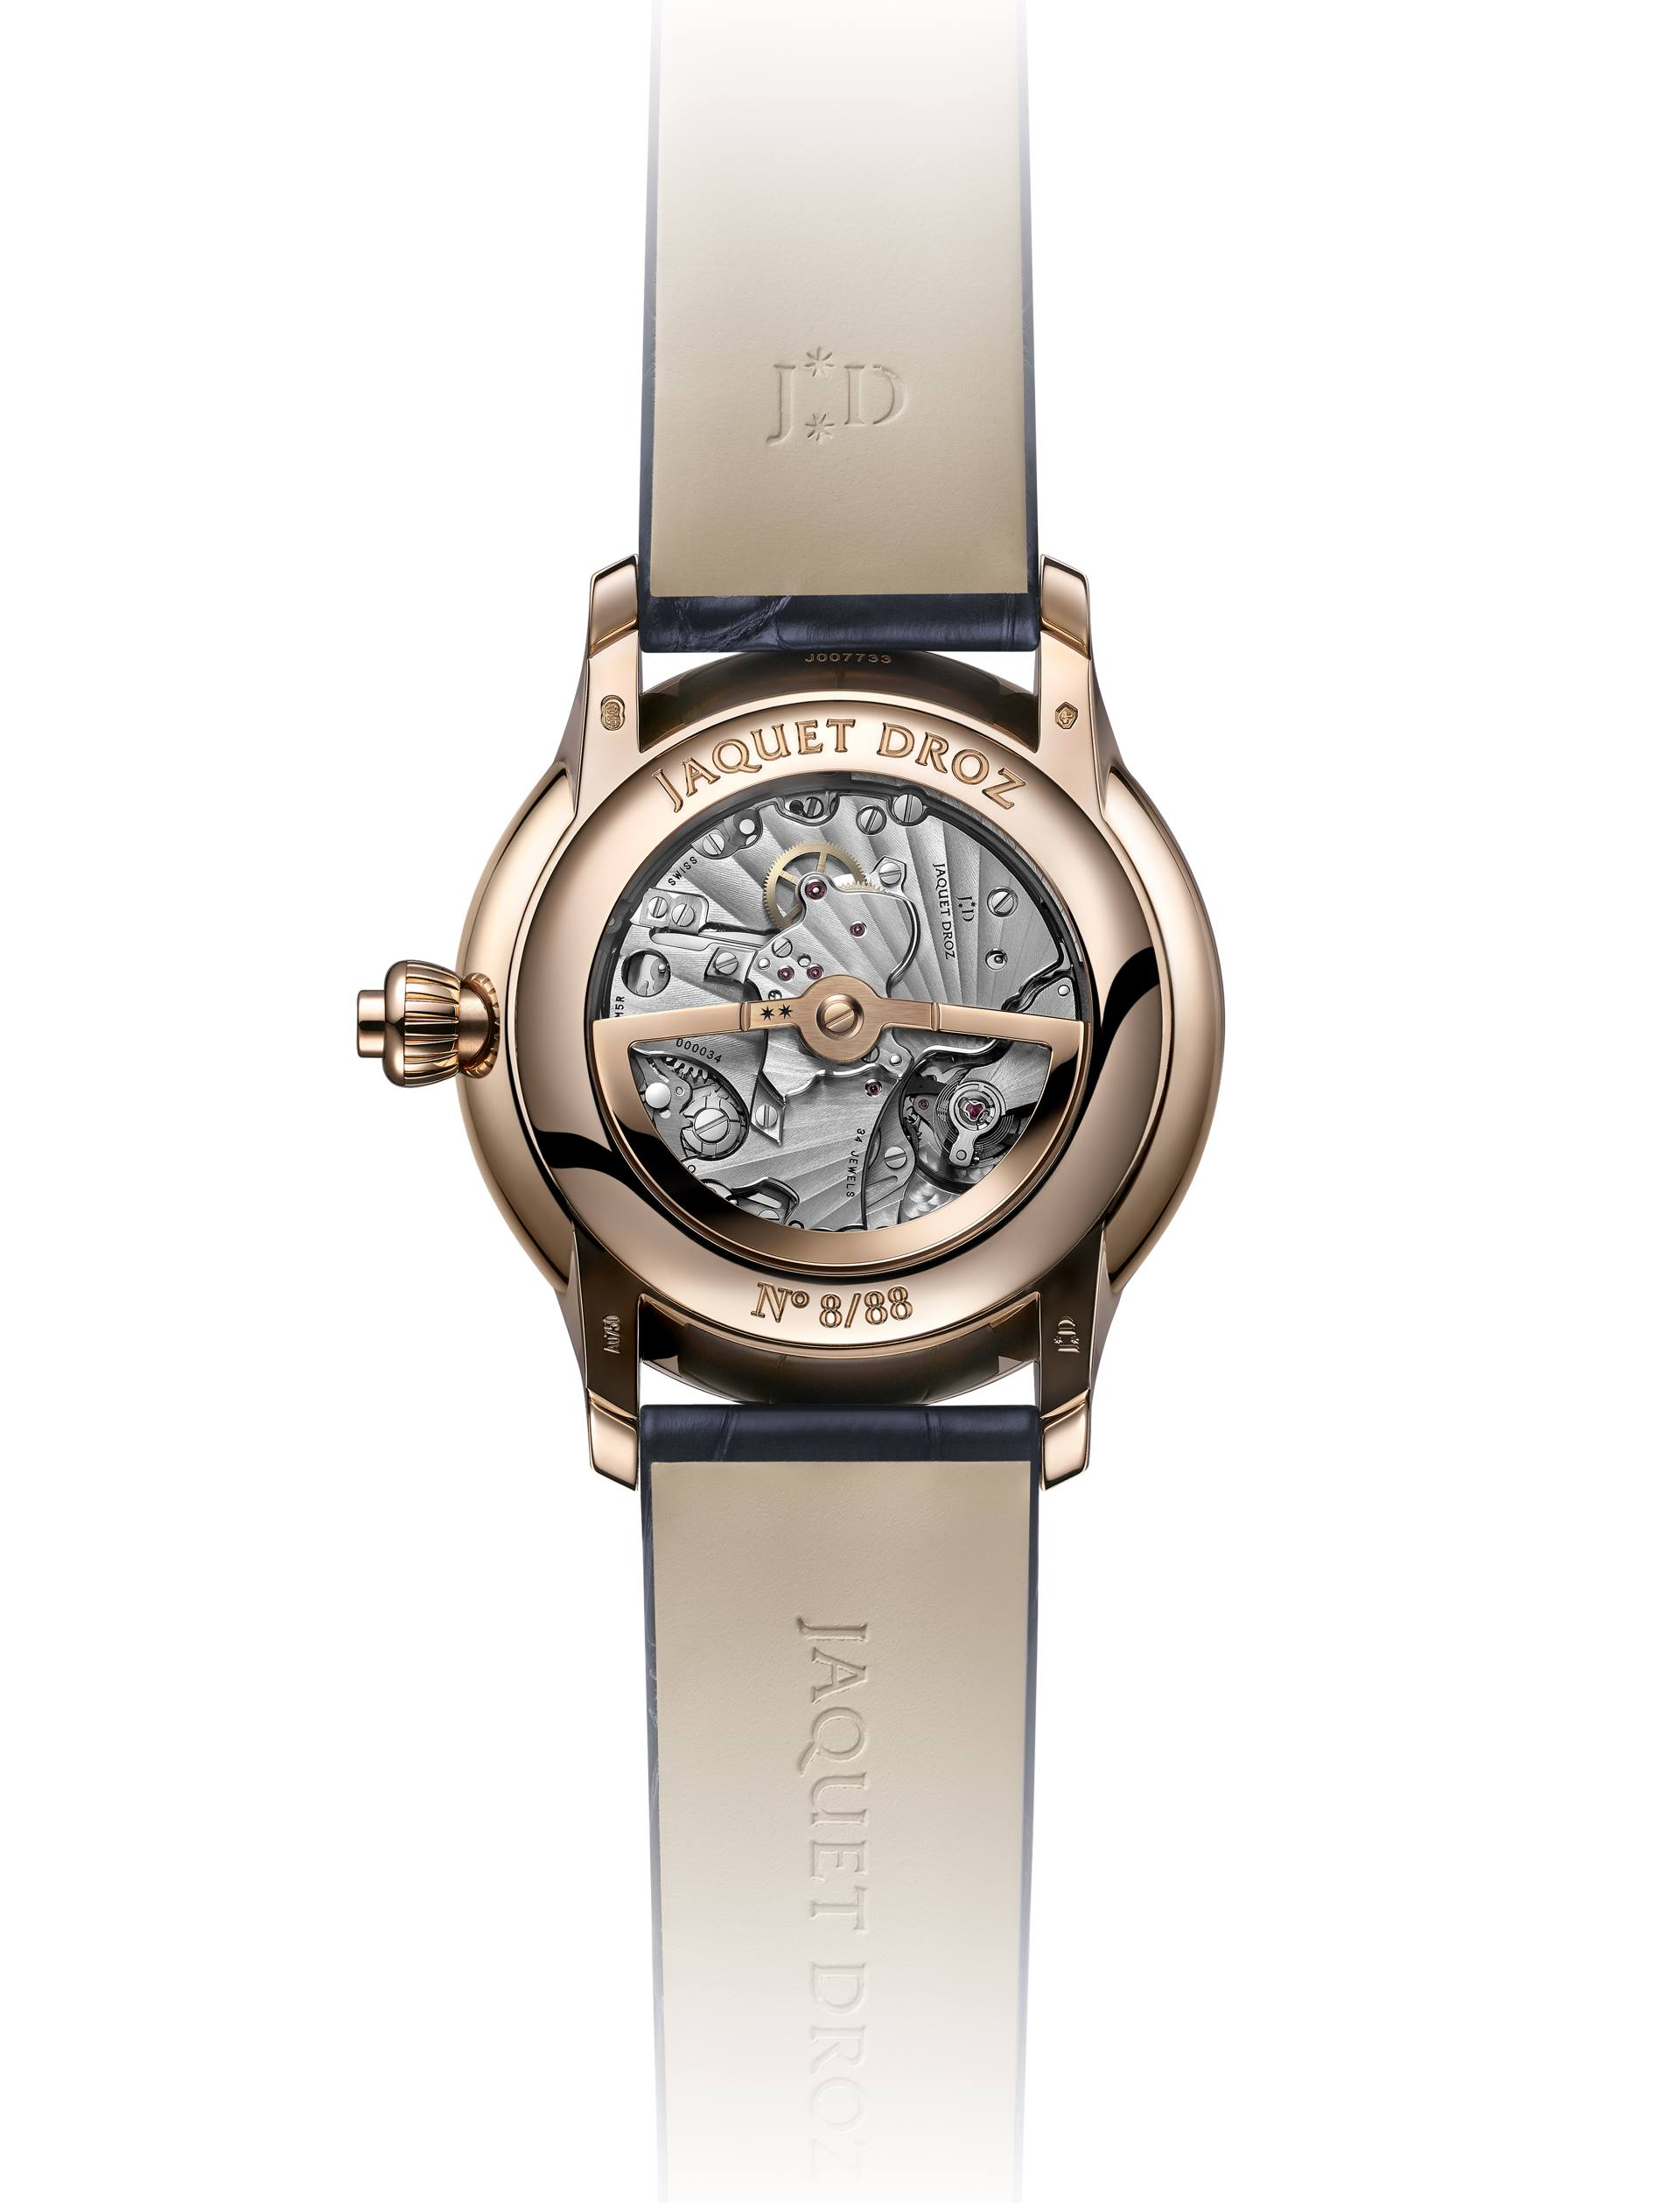 Jaquet Droz: Grande Seconde Chronograph